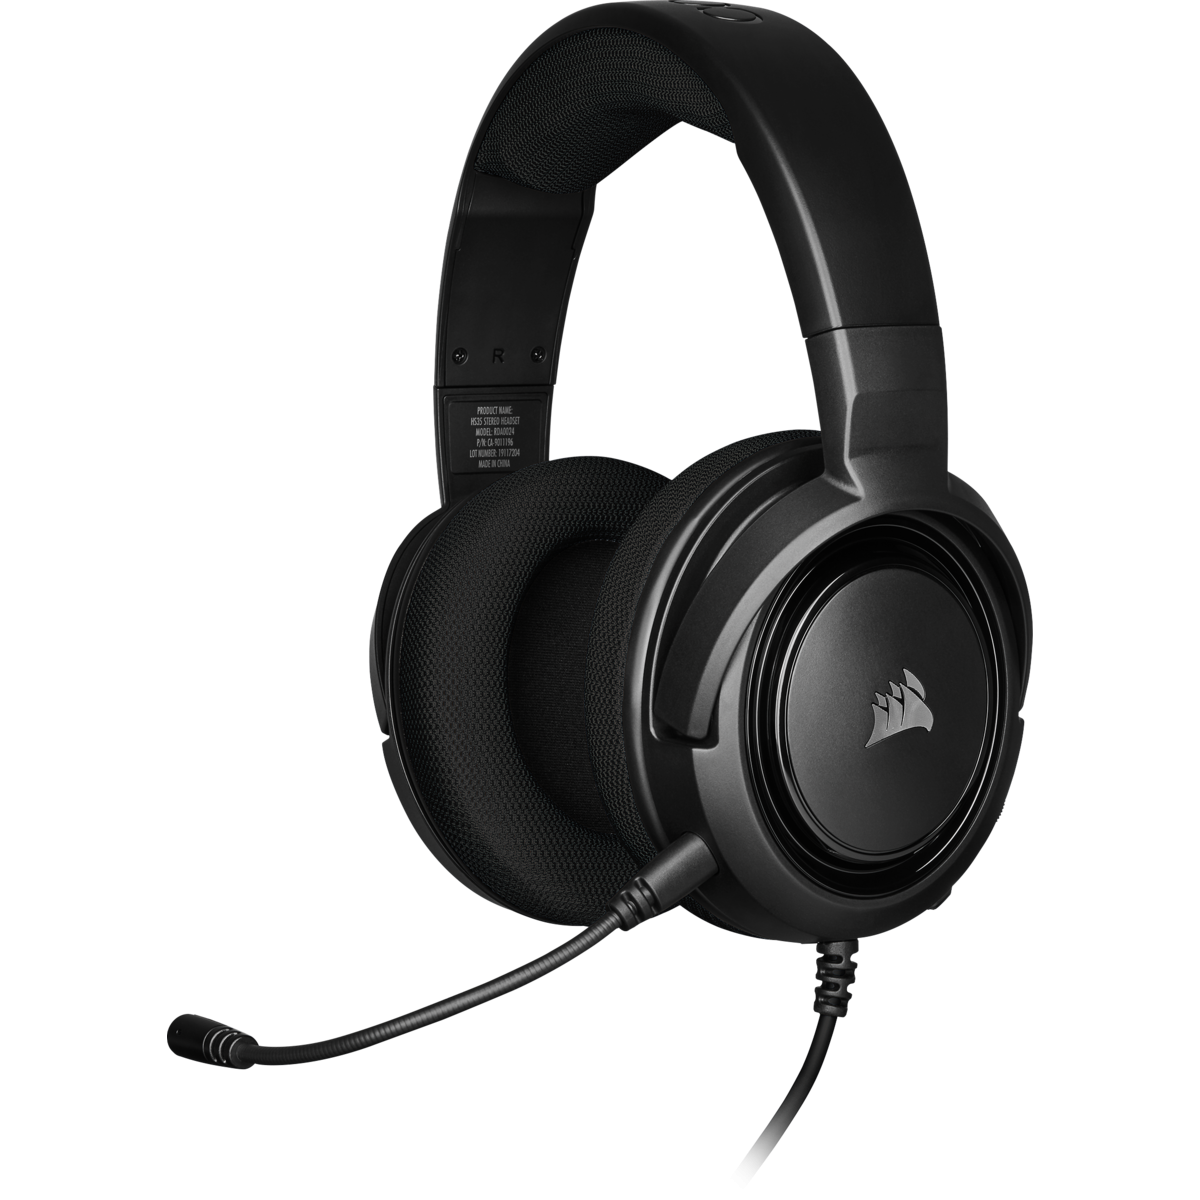 Headset Gamer Corsair HS35 Stereo Carbon, CA-9011195-NA